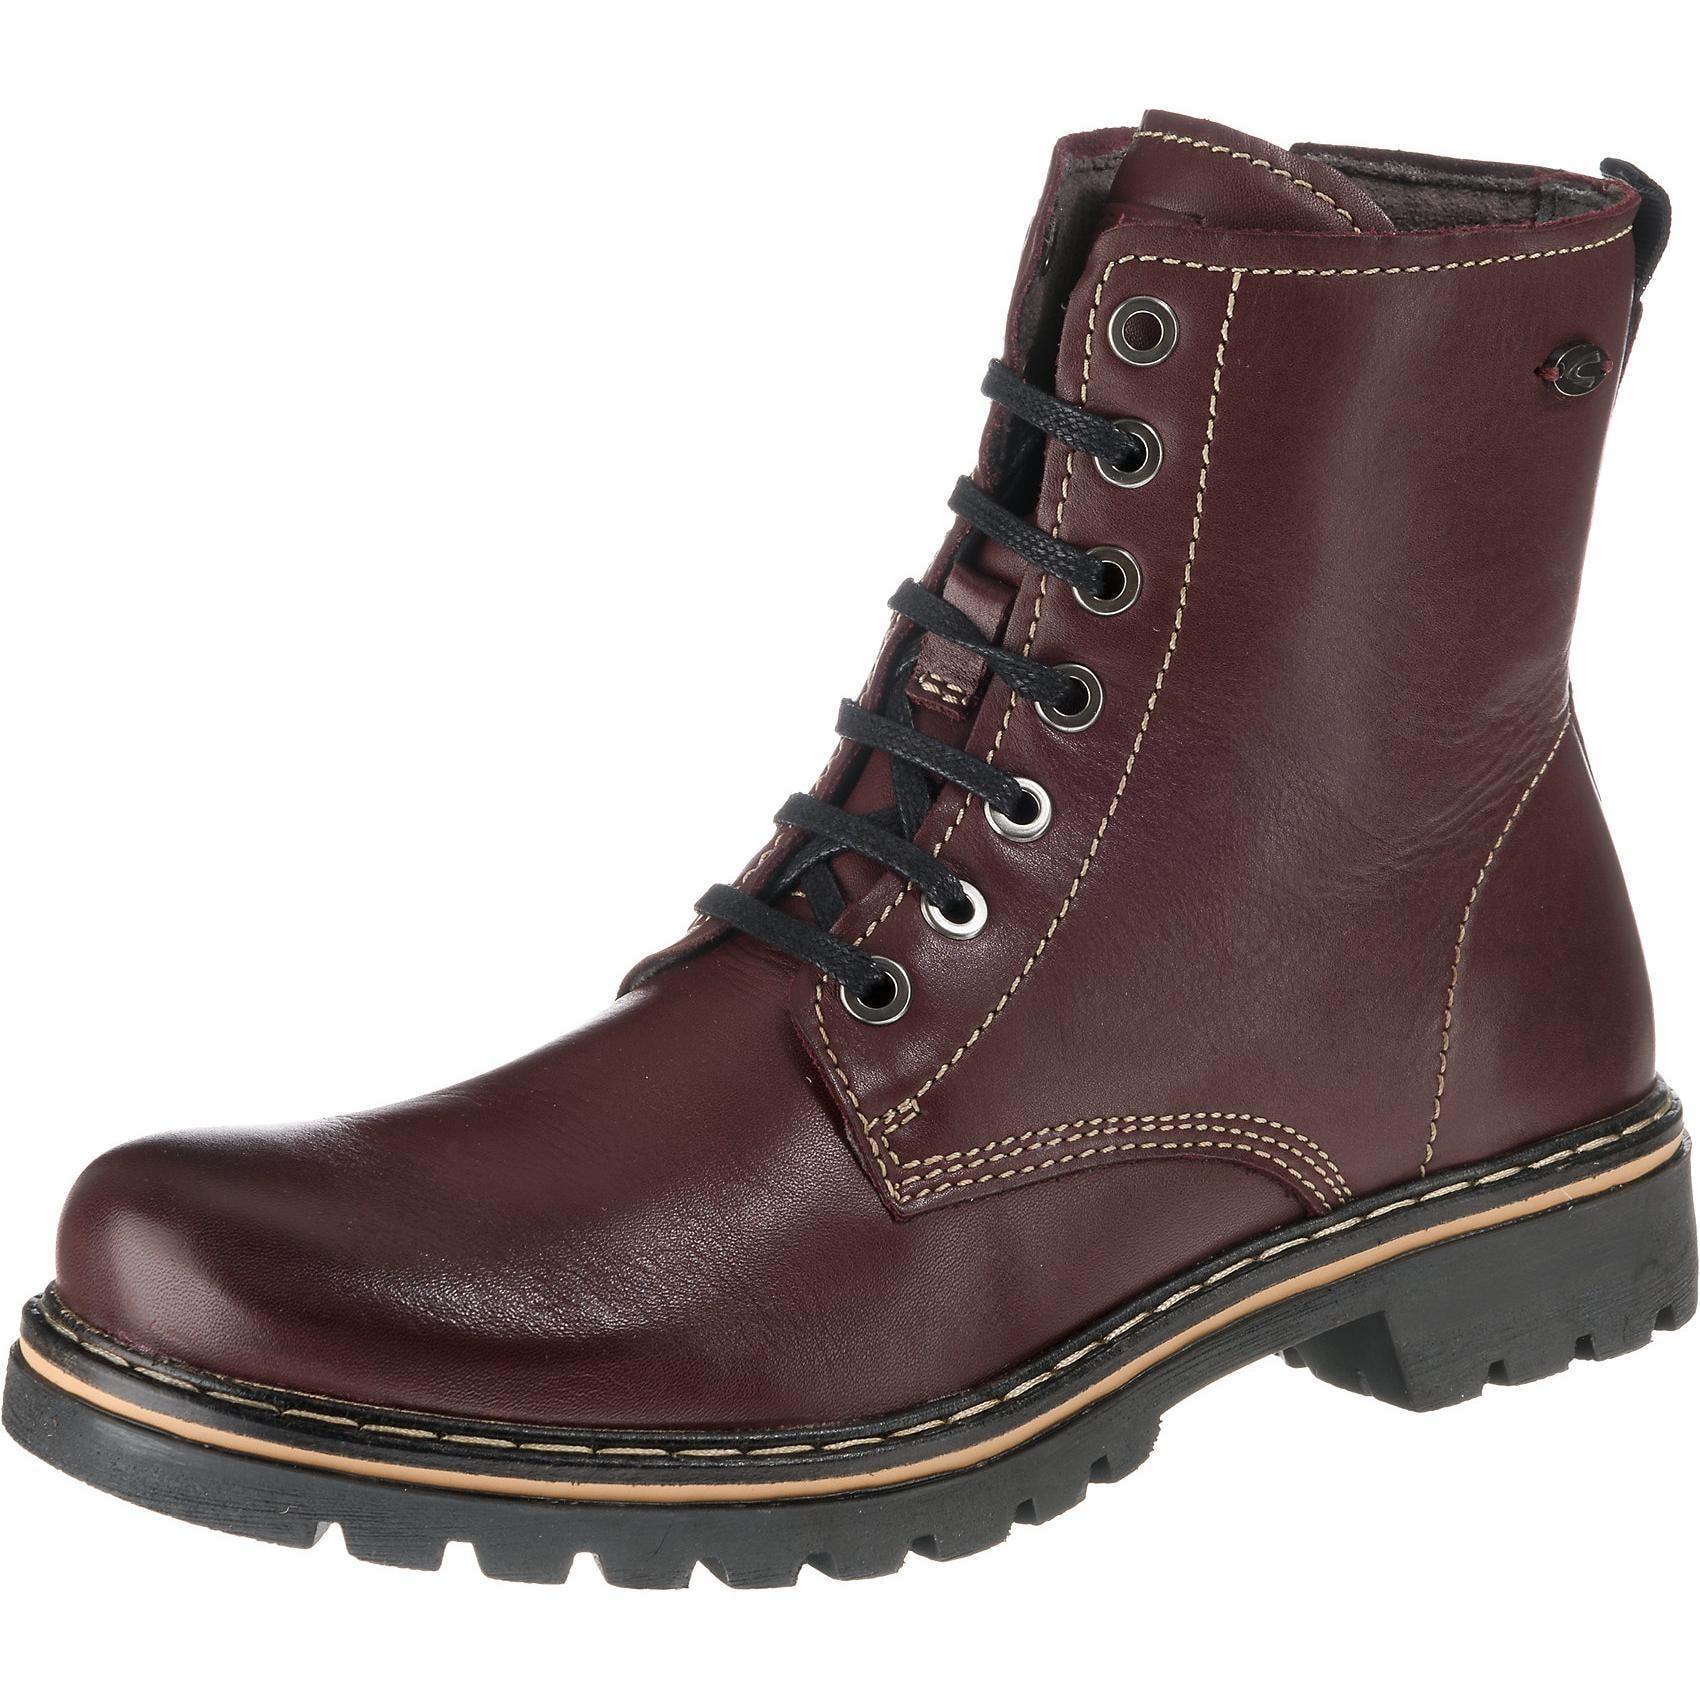 Bestellen » Online Schuhe Rewe Damen iPOkTZXu